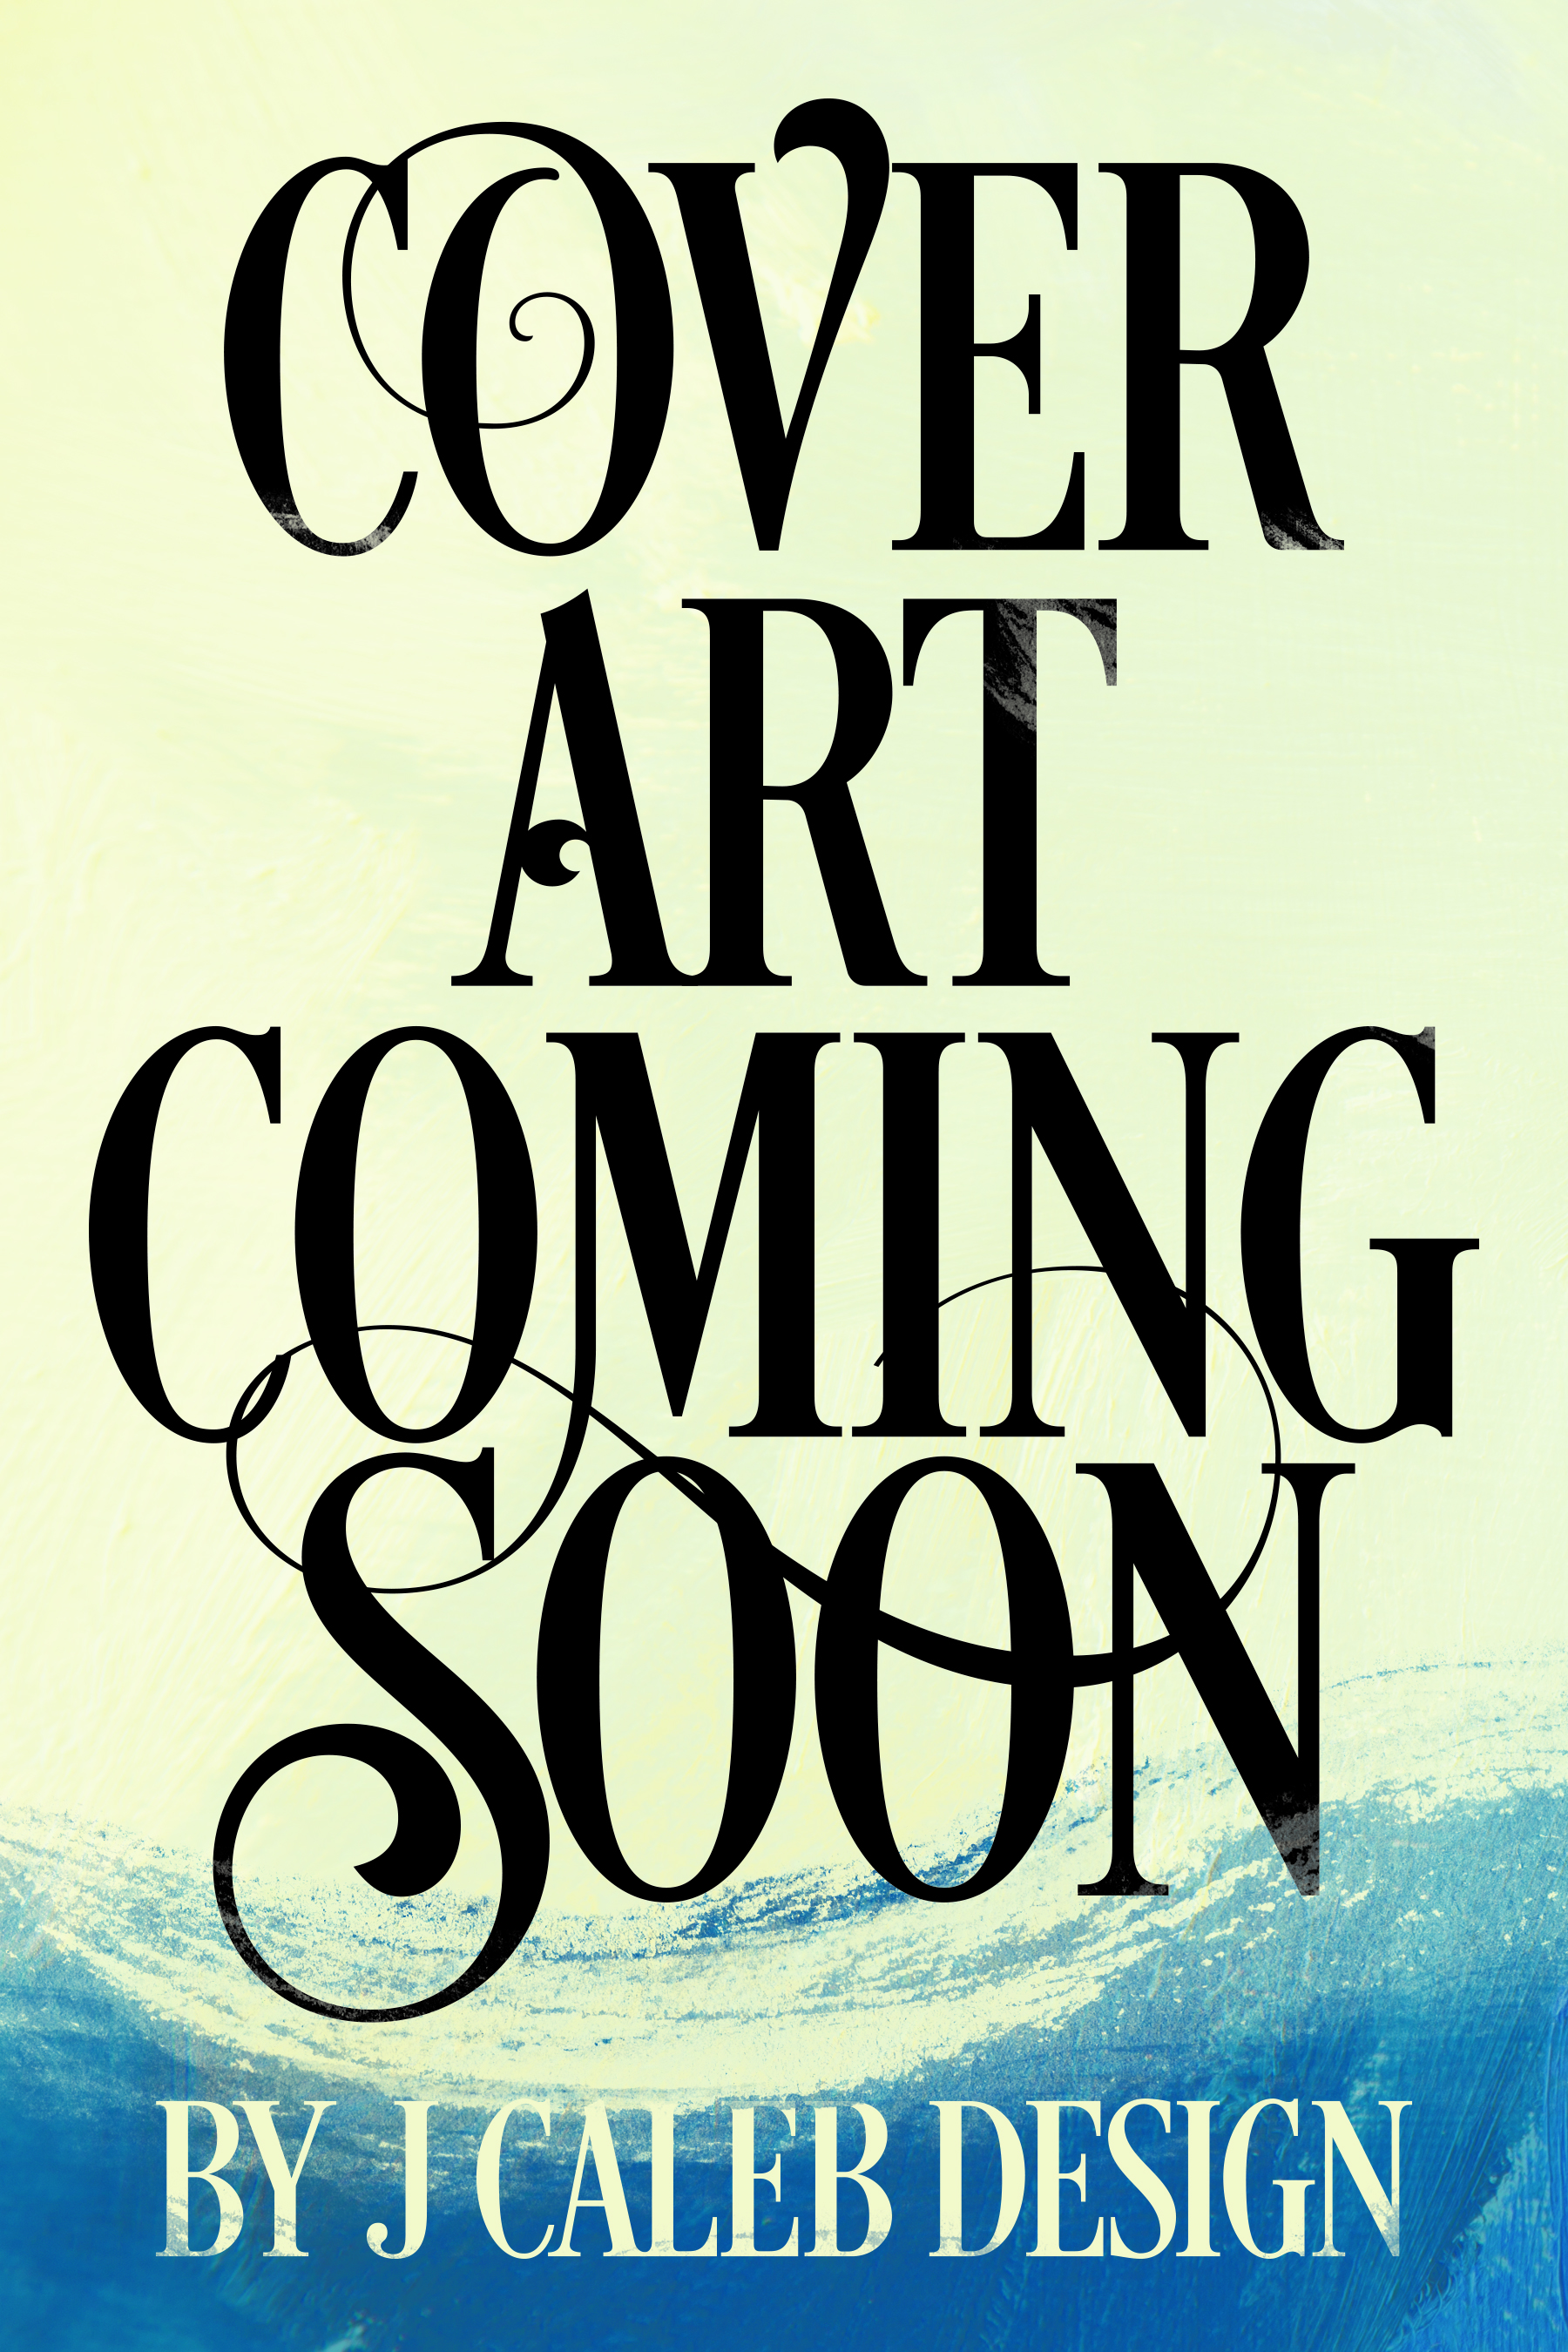 Cover Art Coming Soon.jpg